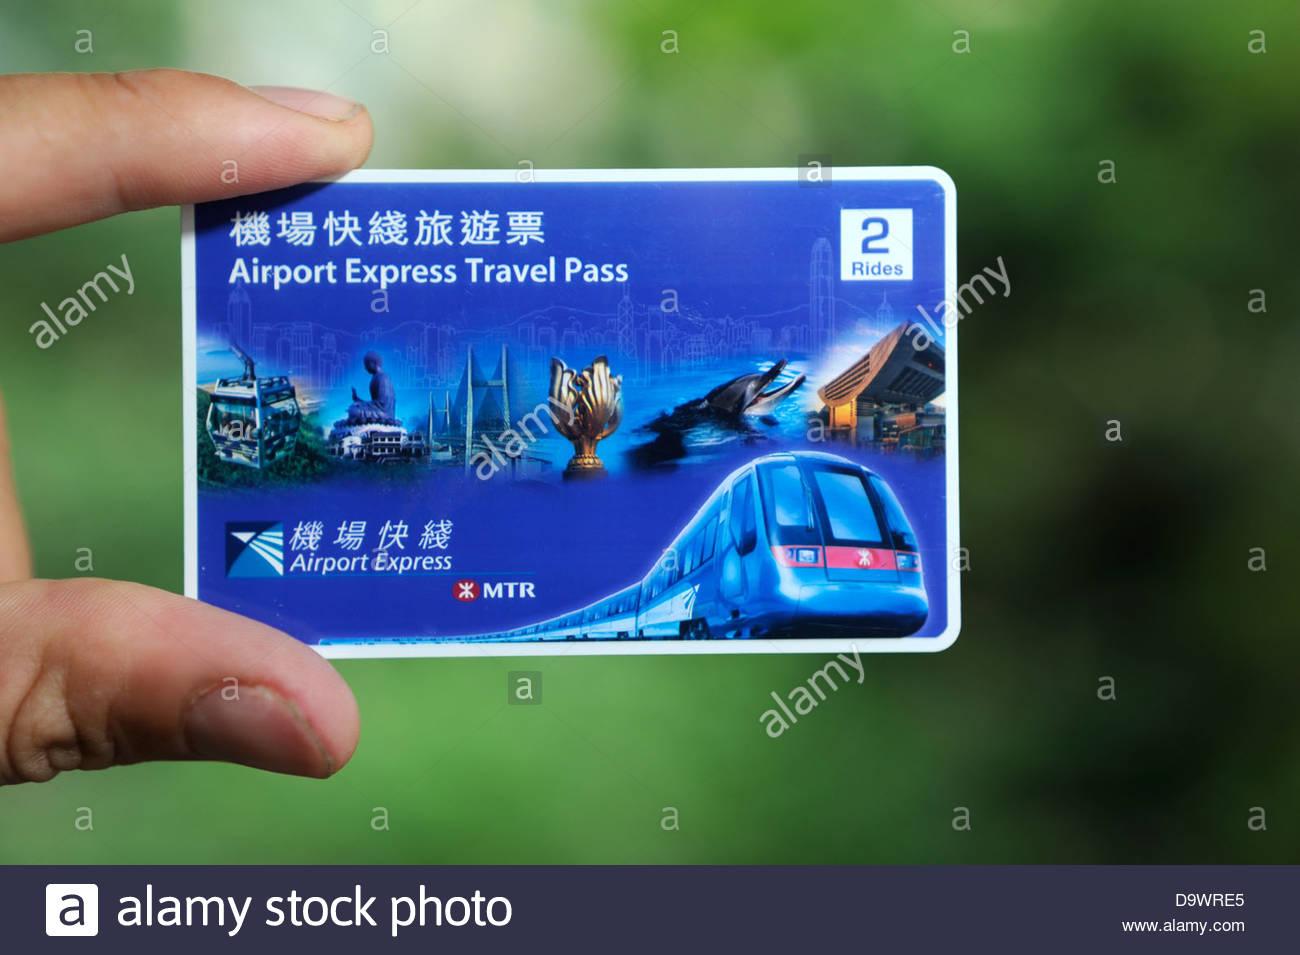 Hong Kong Airport Express travel pass. Immagini Stock